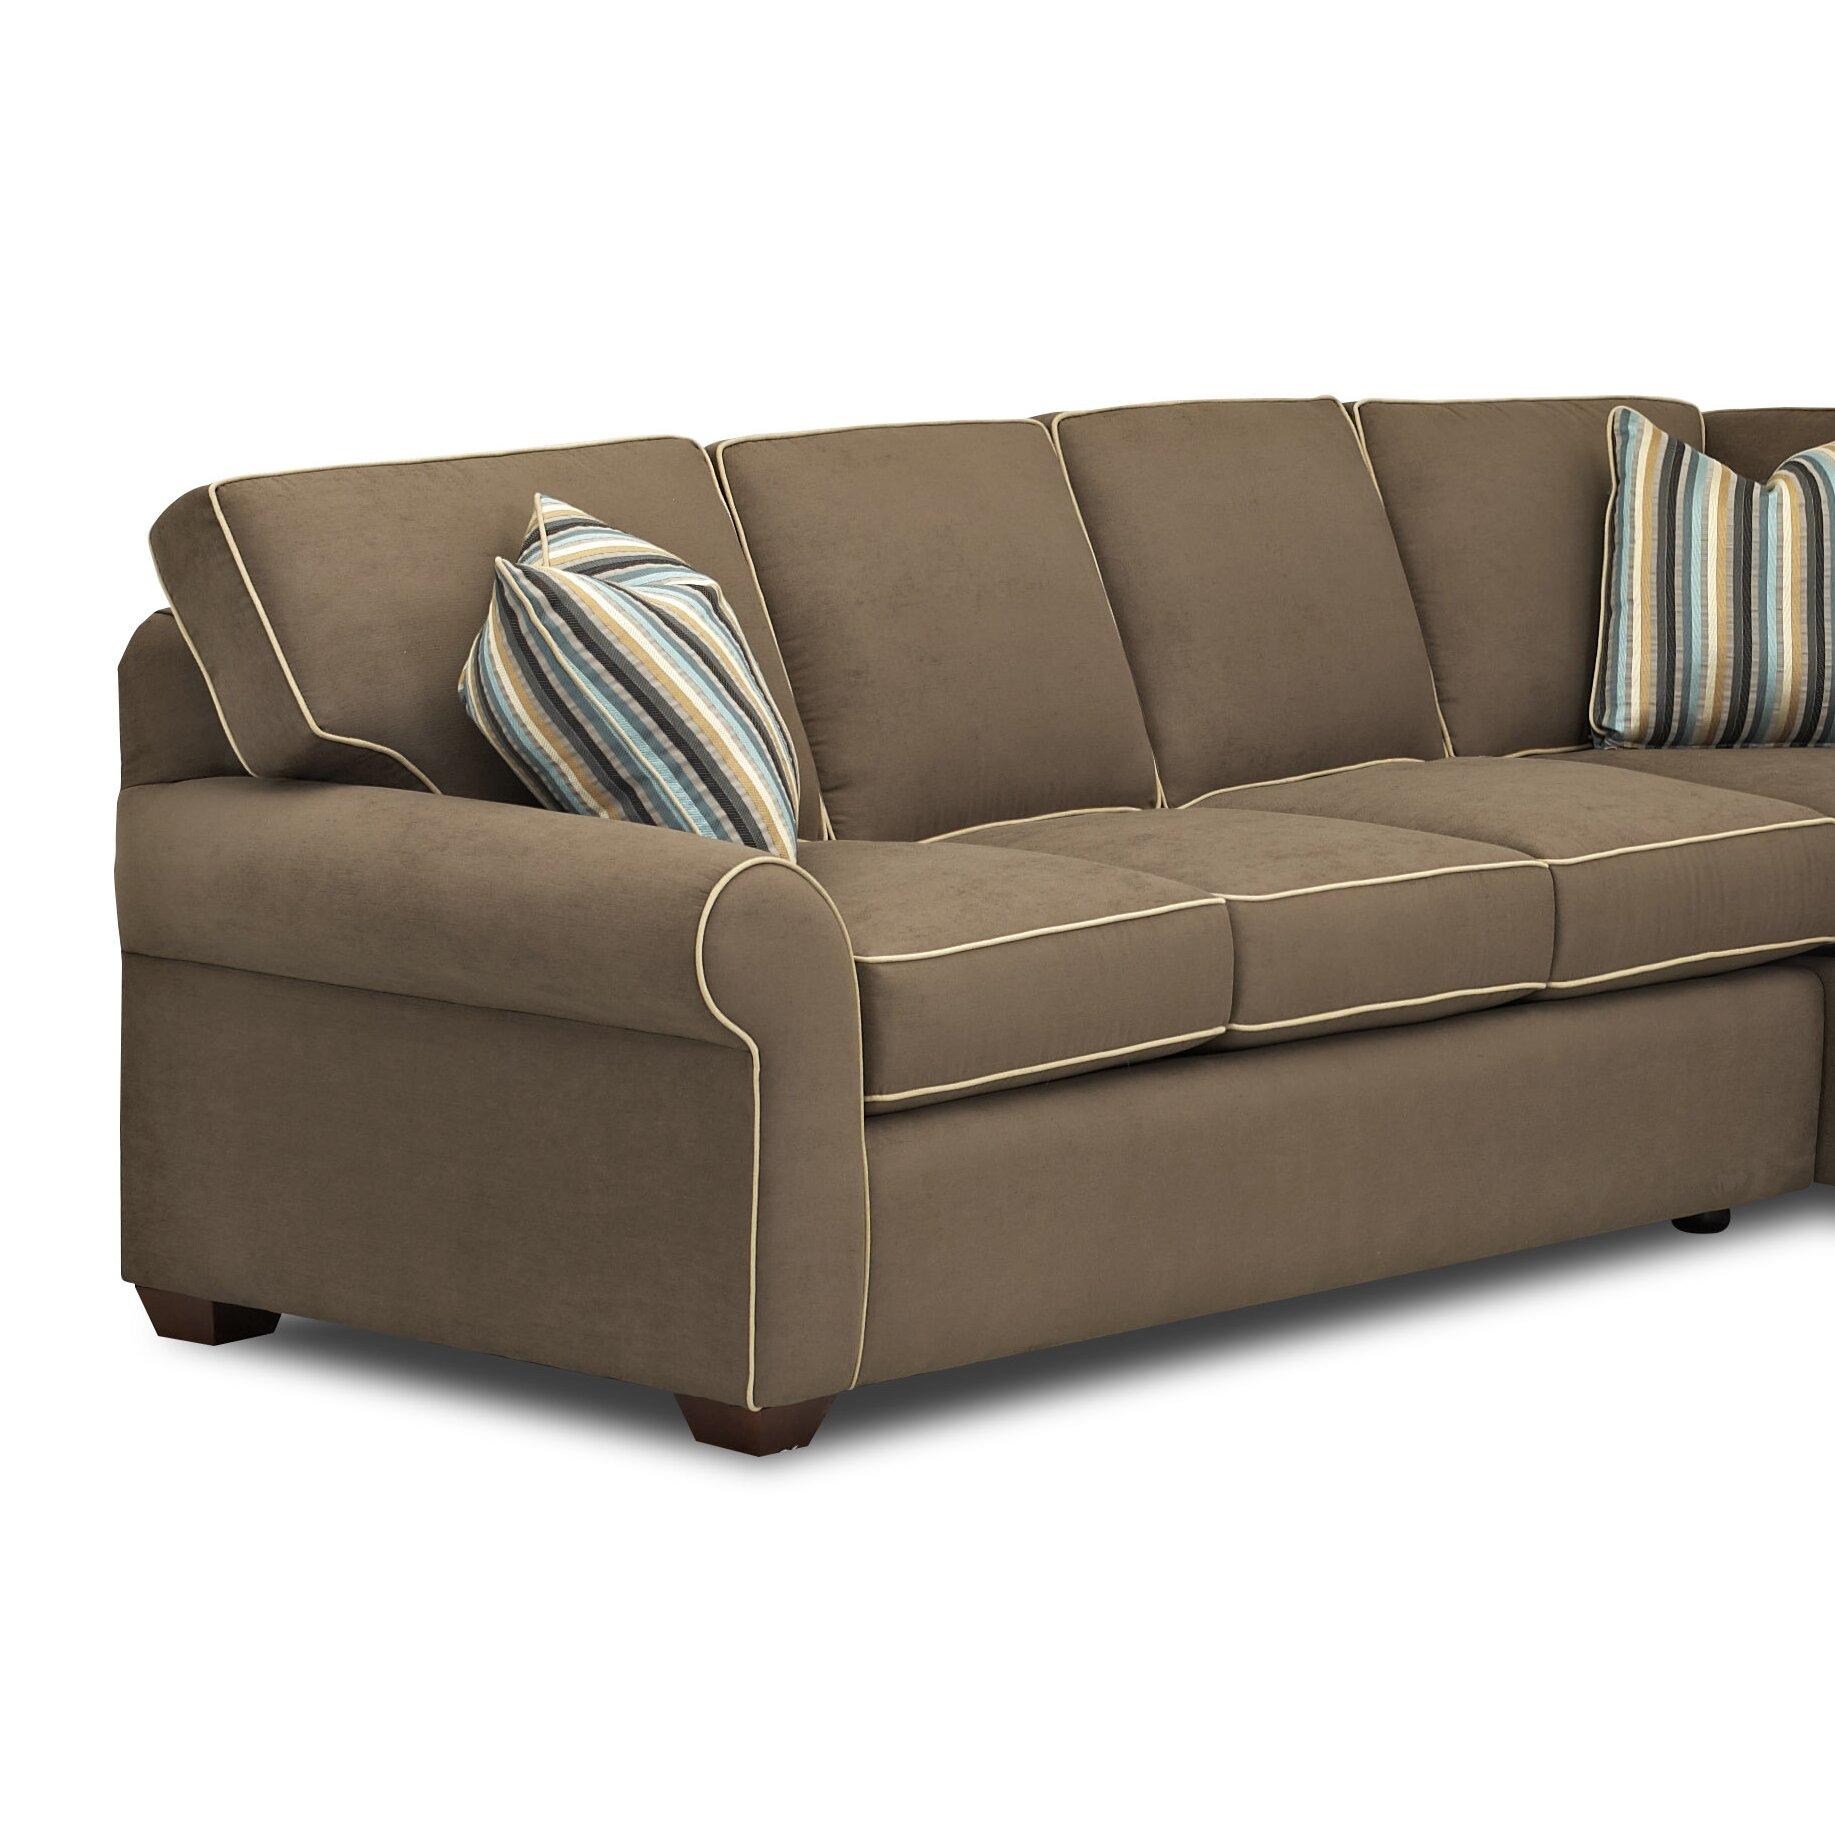 Klaussner Bedroom Furniture Klaussner Furniture Milton Sectional Wayfair